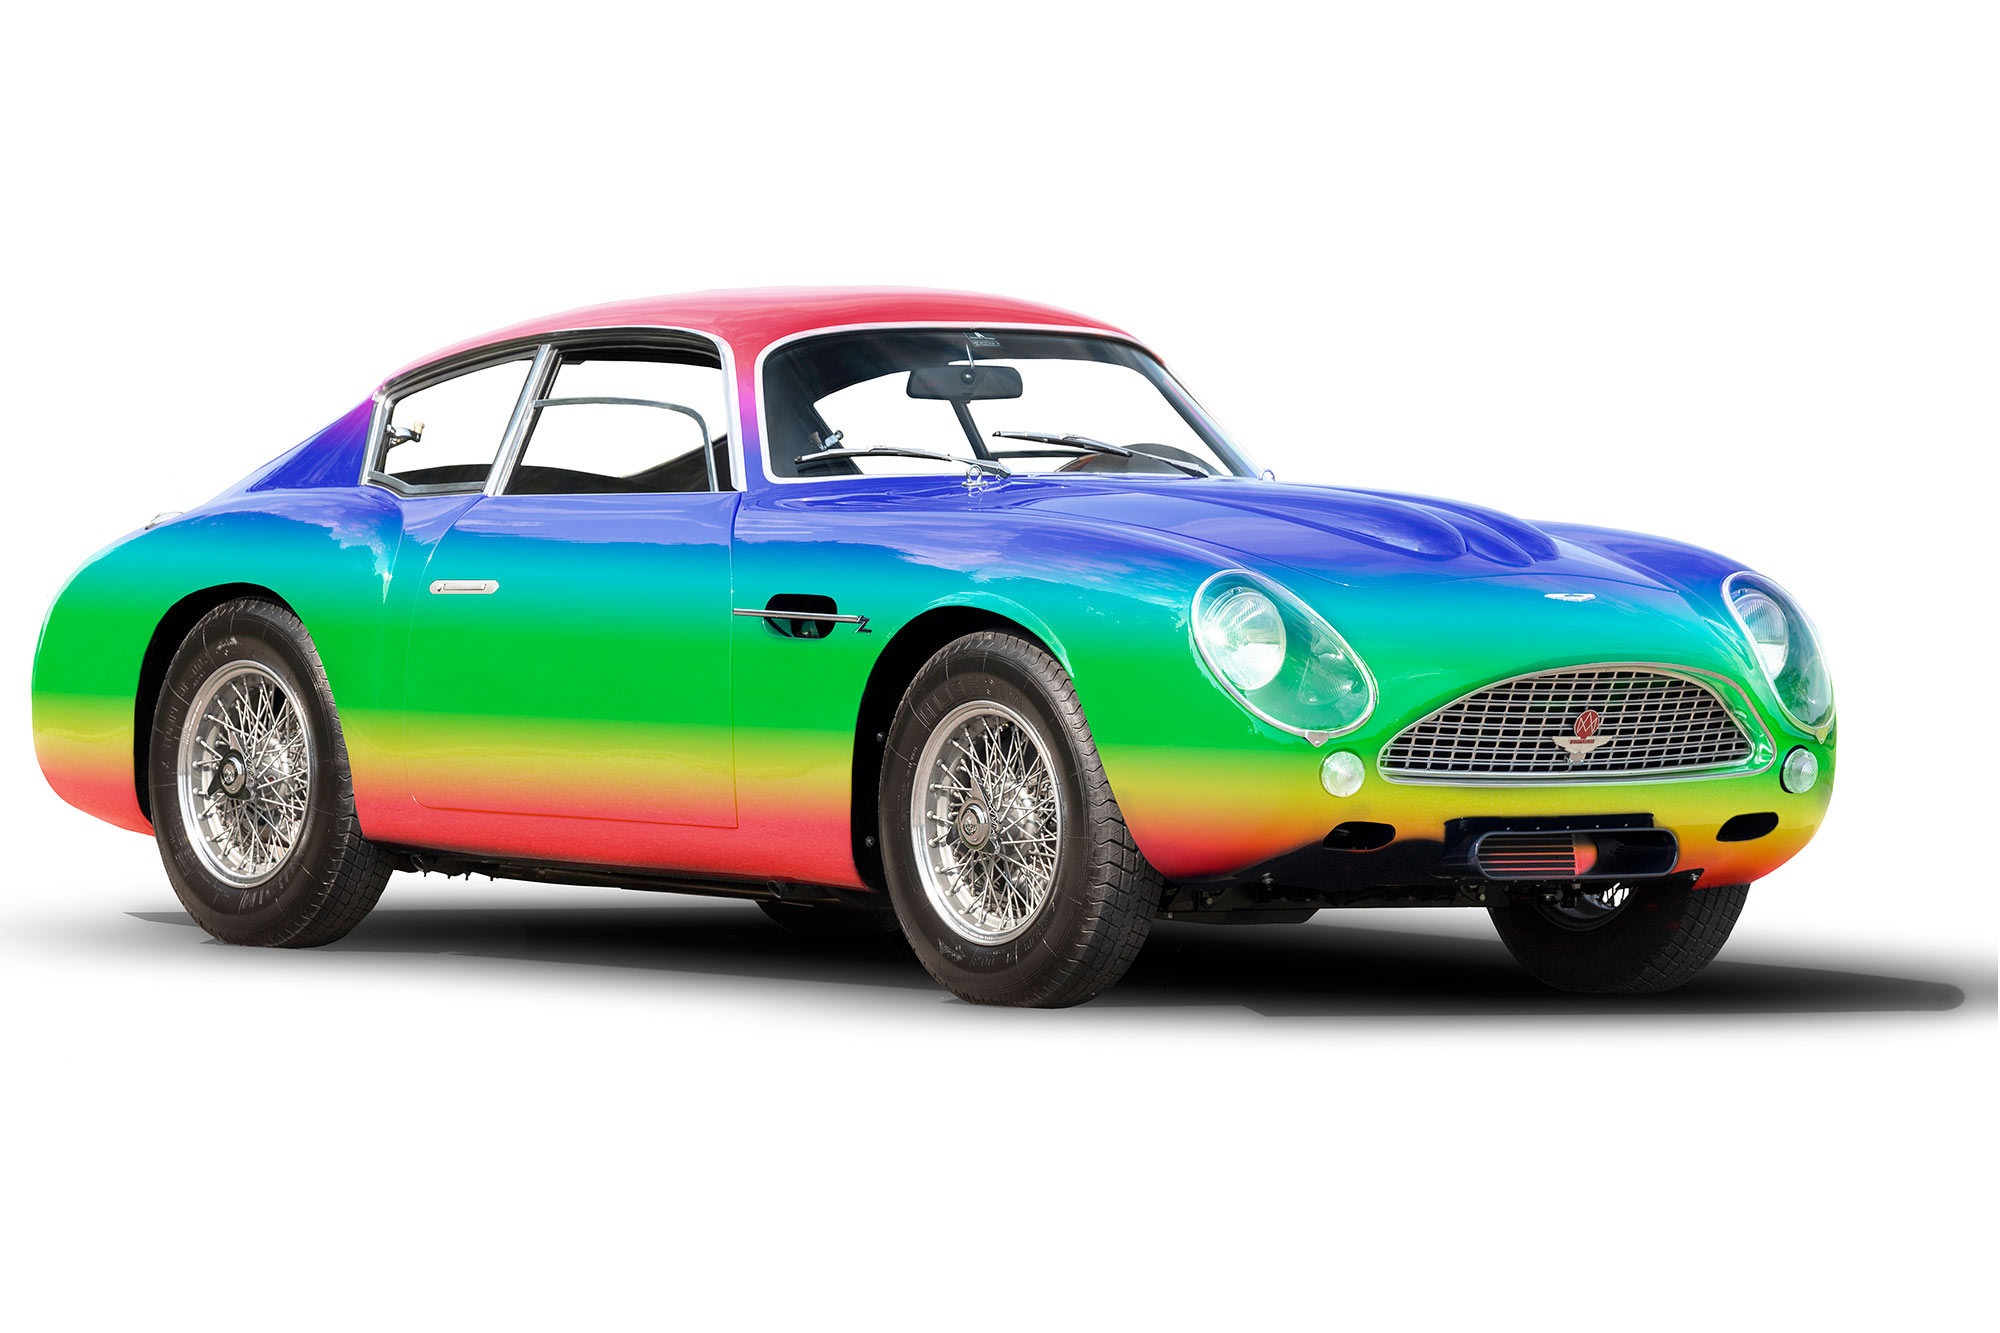 Aston Martin Db4 Gt Zagato Recreation For Sale Adrian Johnson